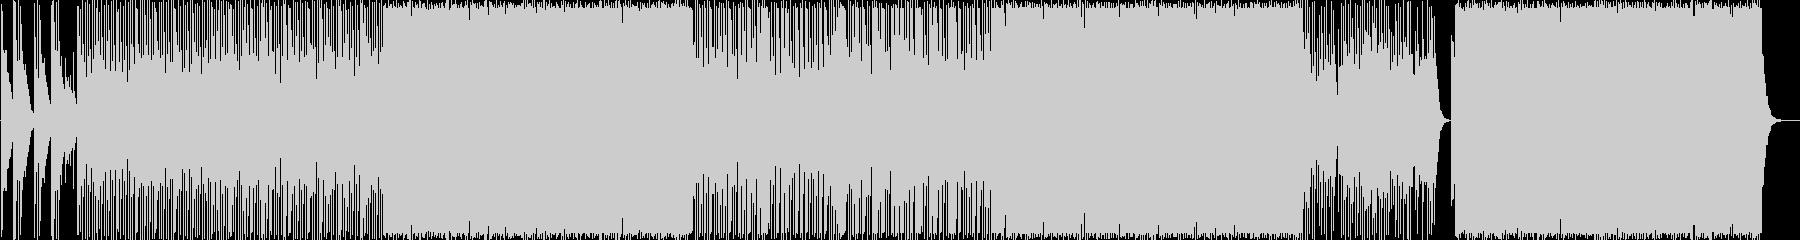 和風/和楽器(三味線・琴・太鼓)/B4の未再生の波形